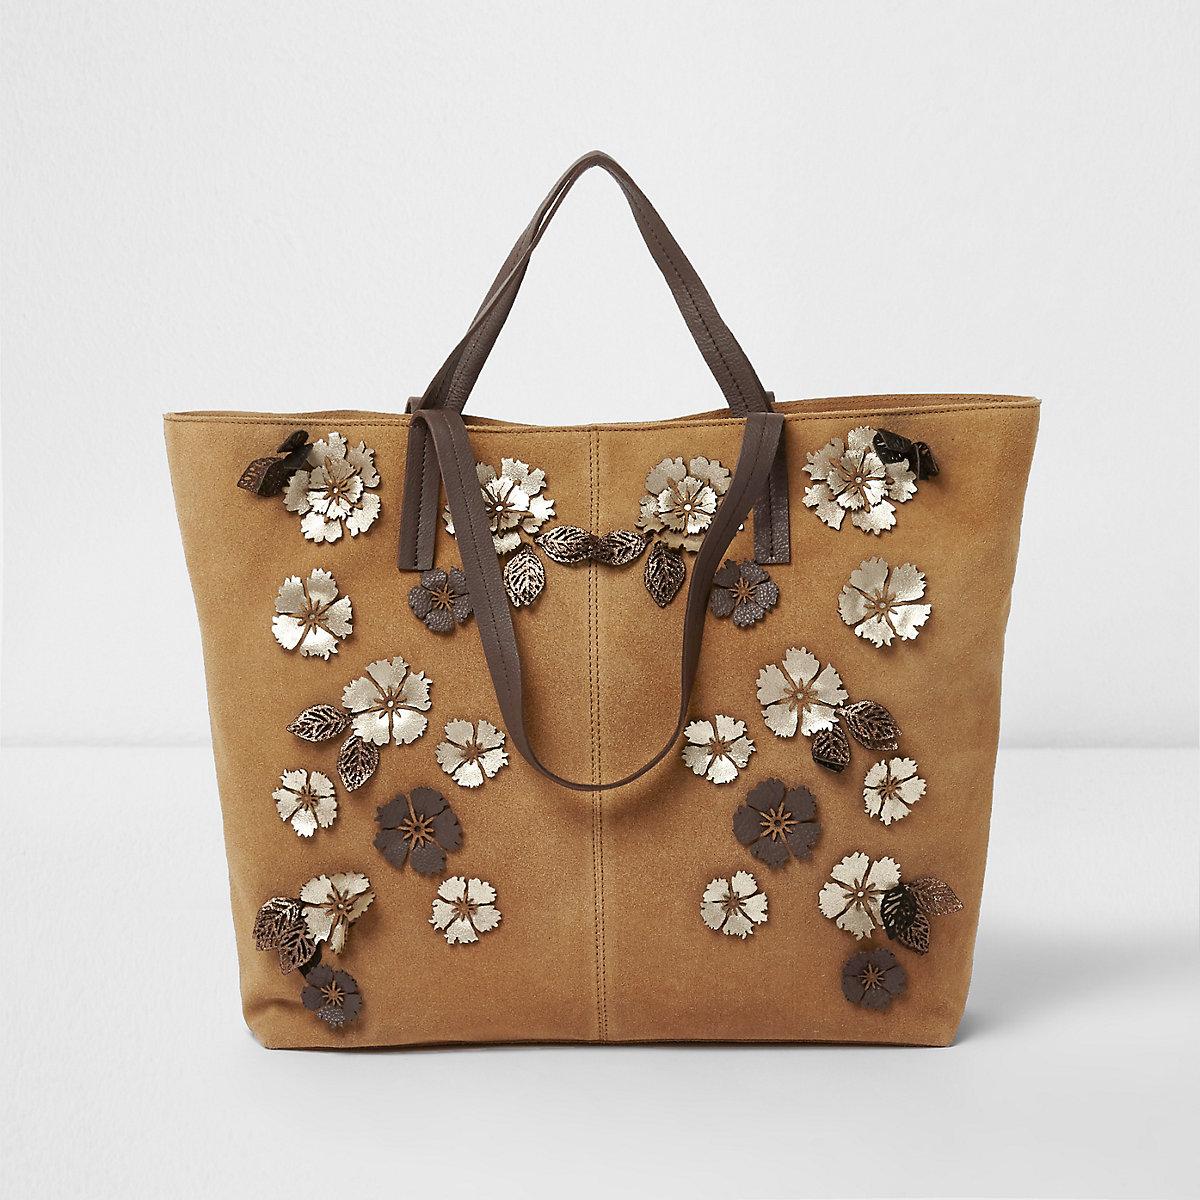 Tan suede 3D flower detail large tote bag